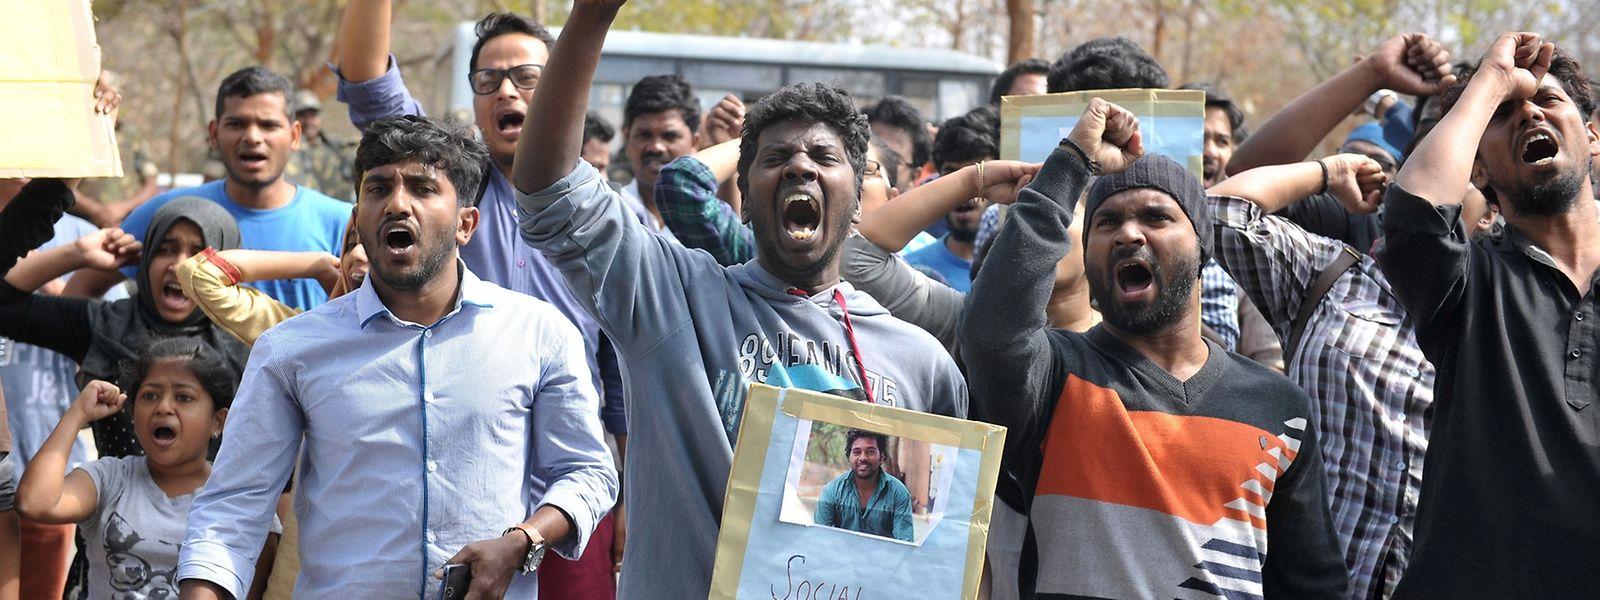 Indische Studenten protestieren im Namen ihres toten Kollegen Rohith Vemula.